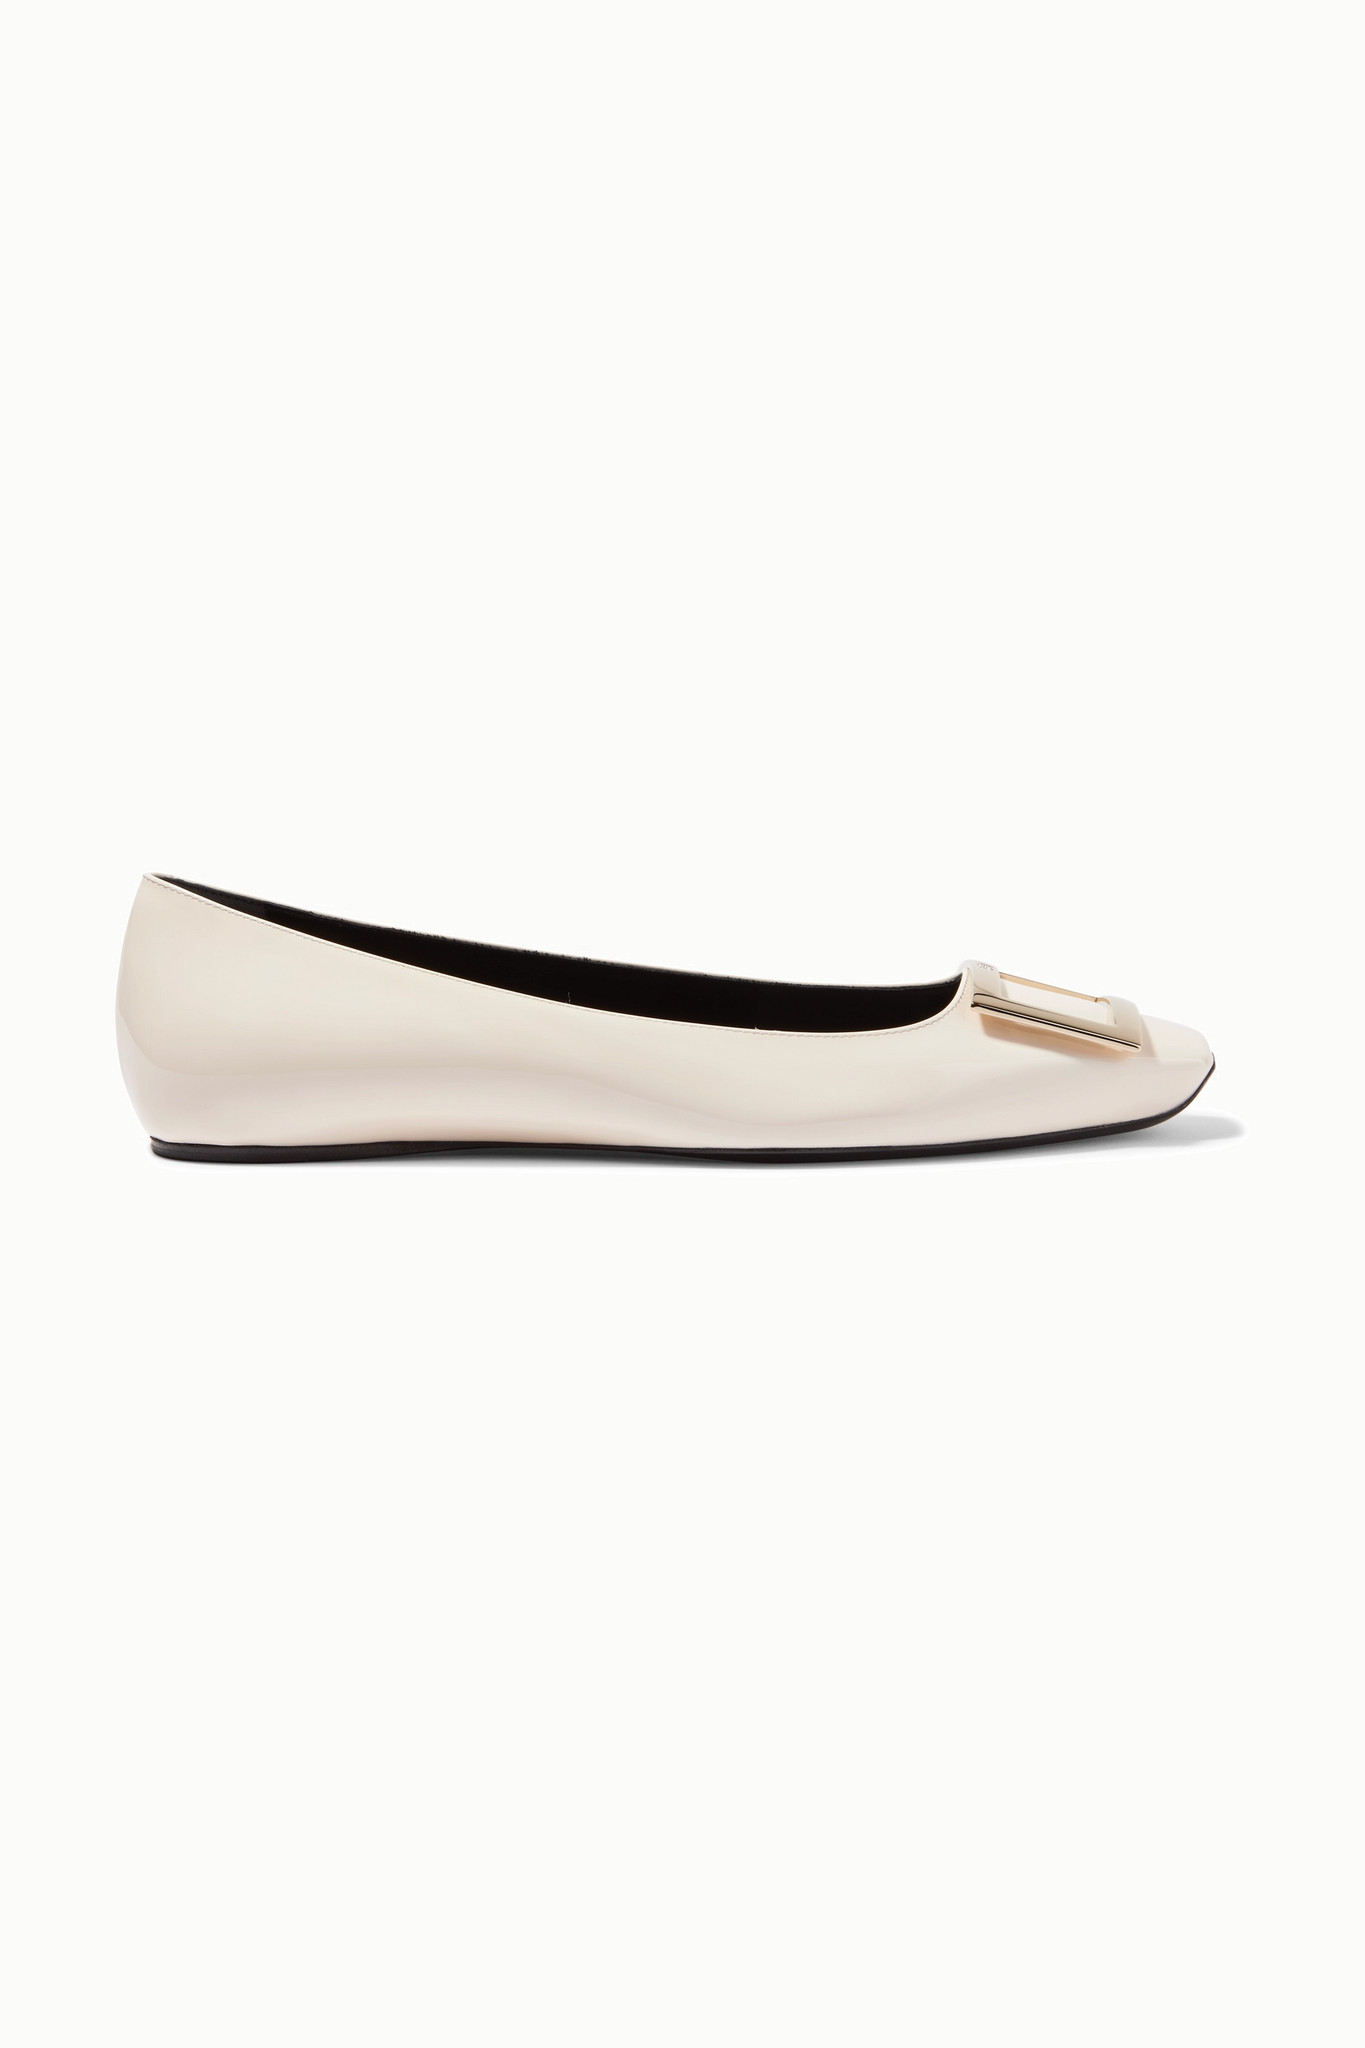 ROGER VIVIER - Trompette Bellerine Patent-leather Ballet Flats - White - IT40.5